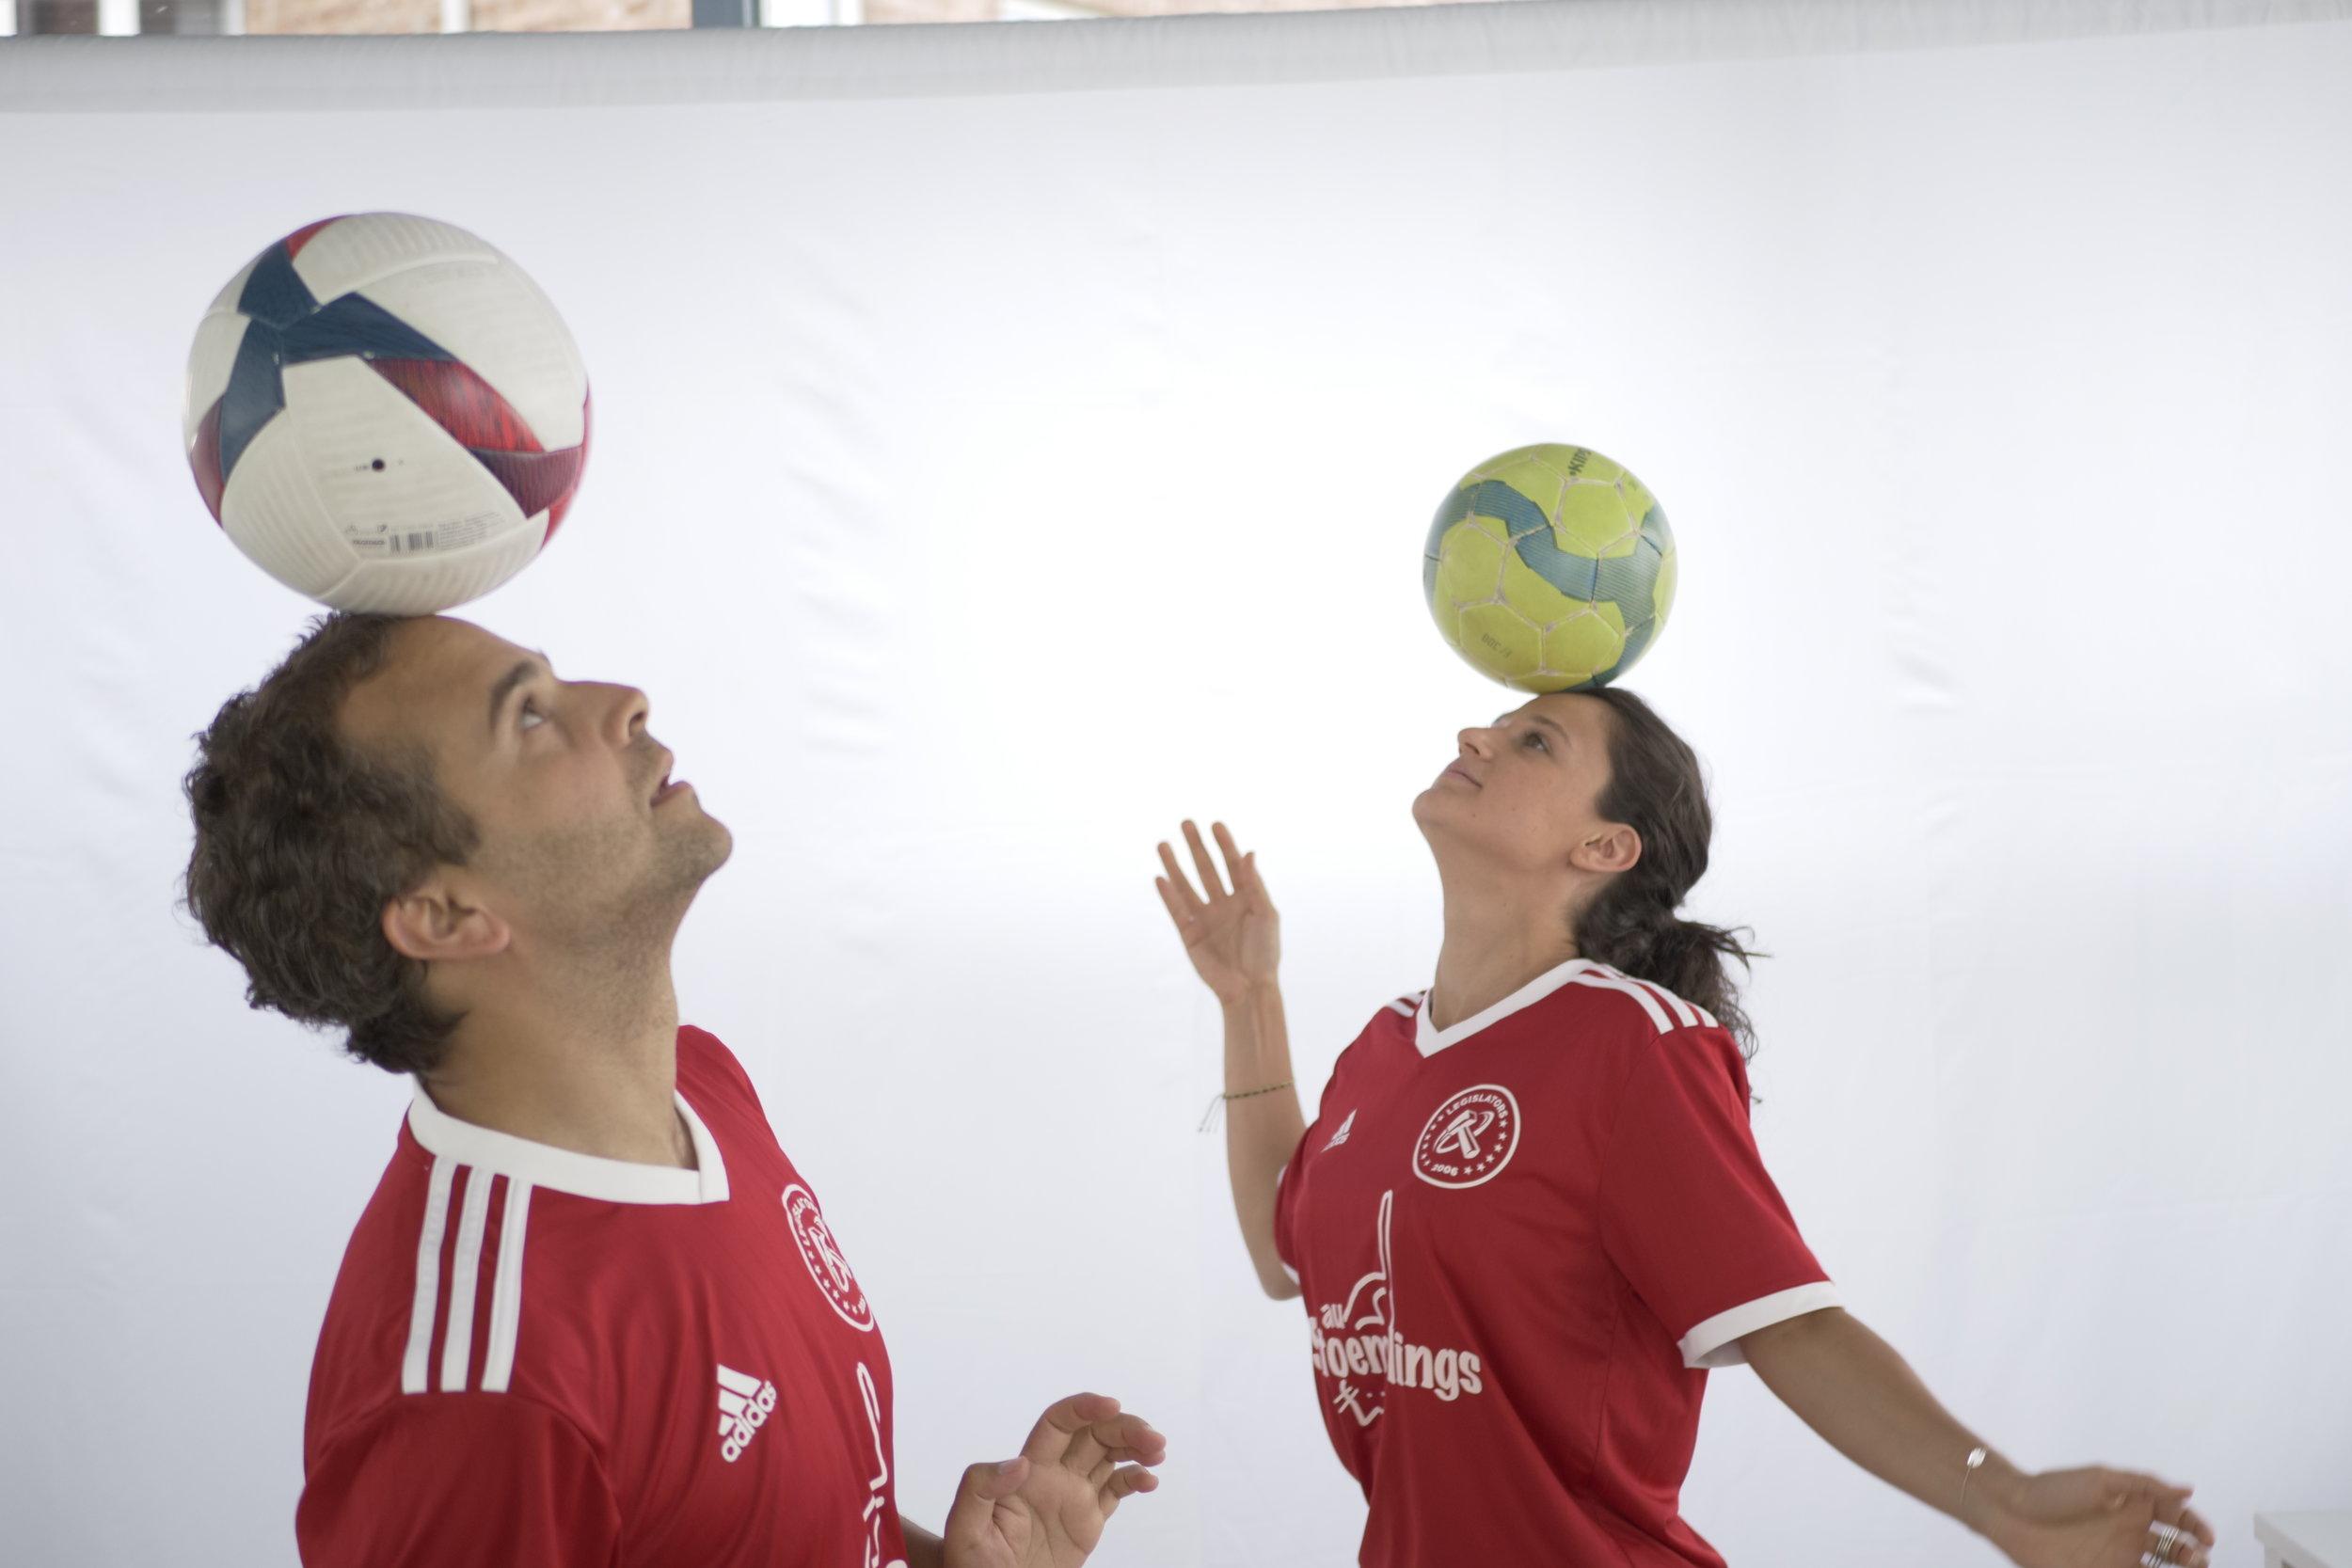 Hebe League - The Football League was……